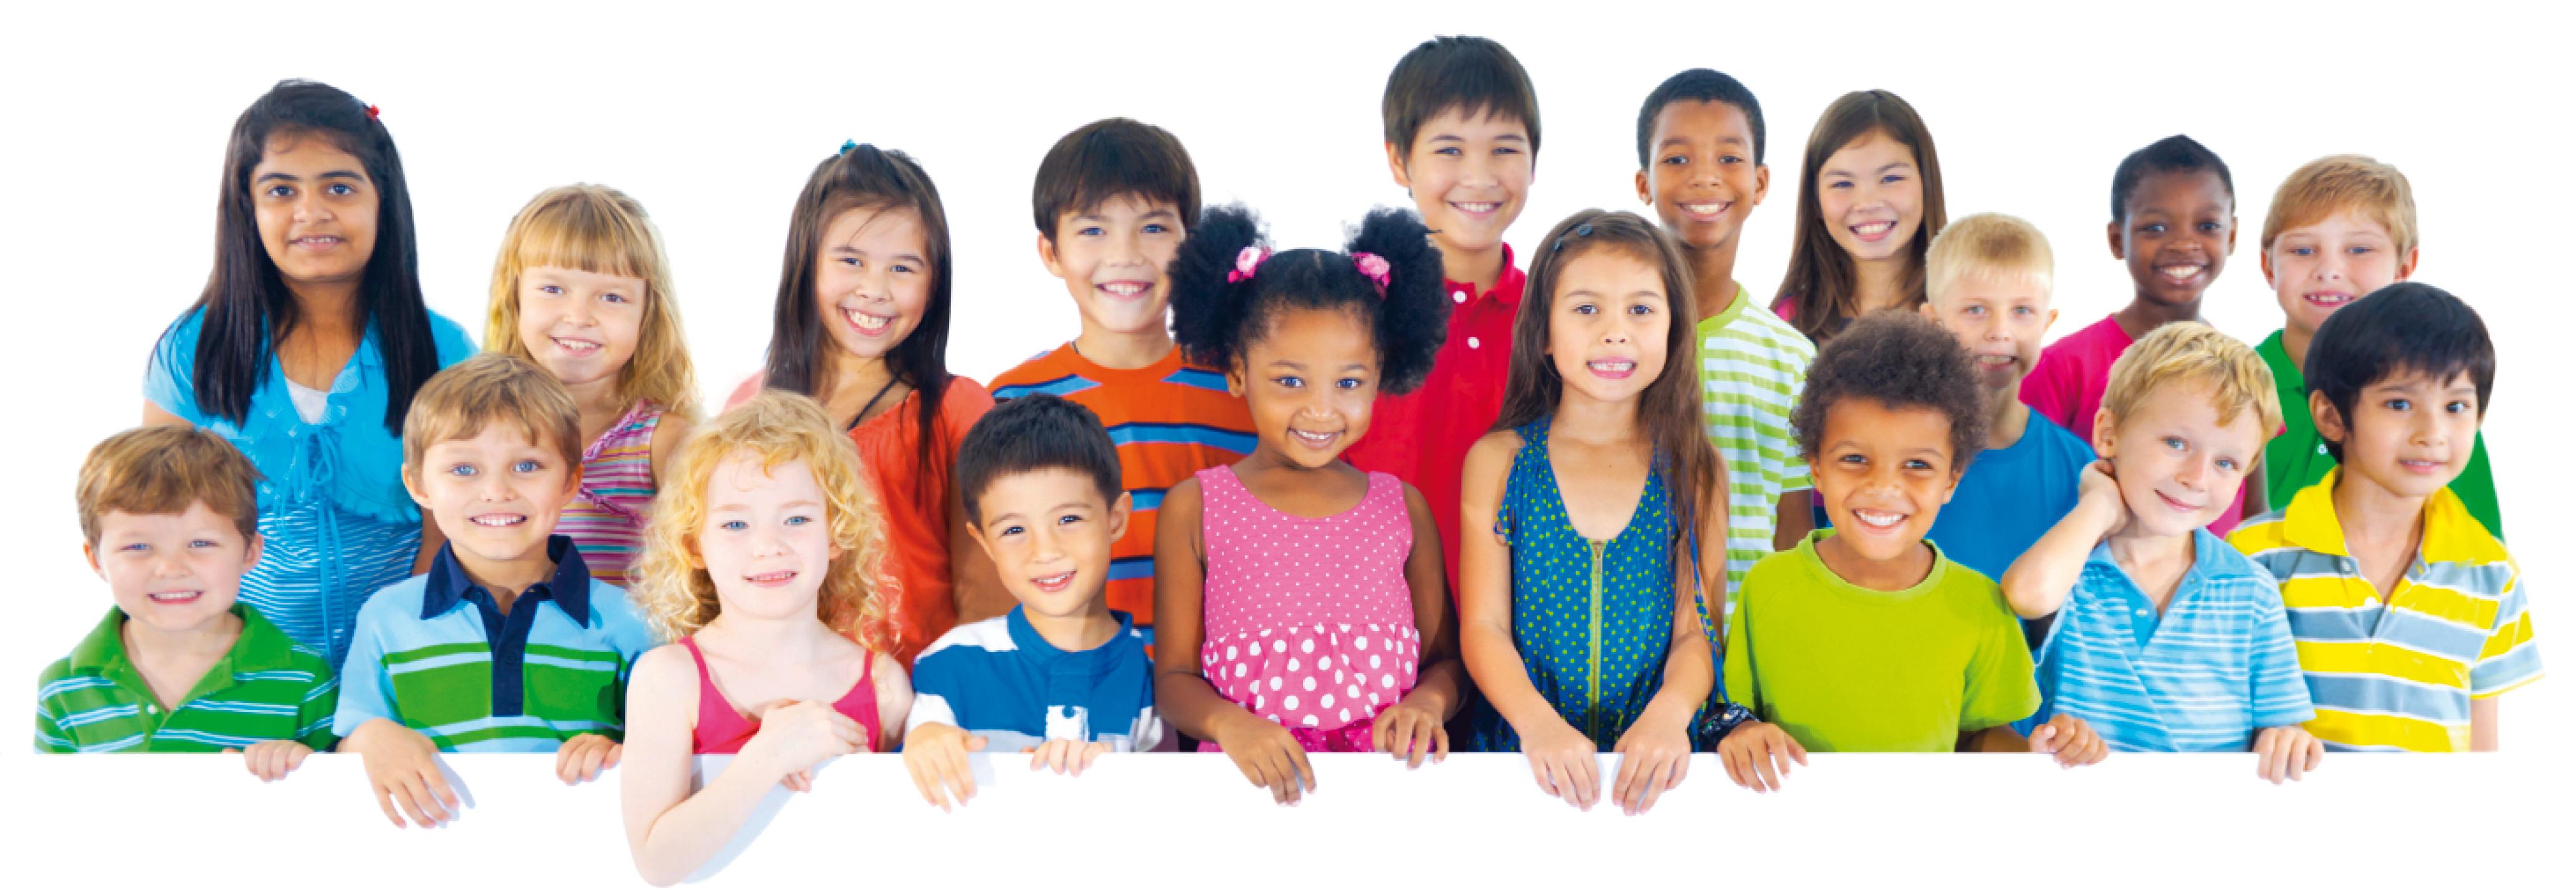 children-the-library-for-children